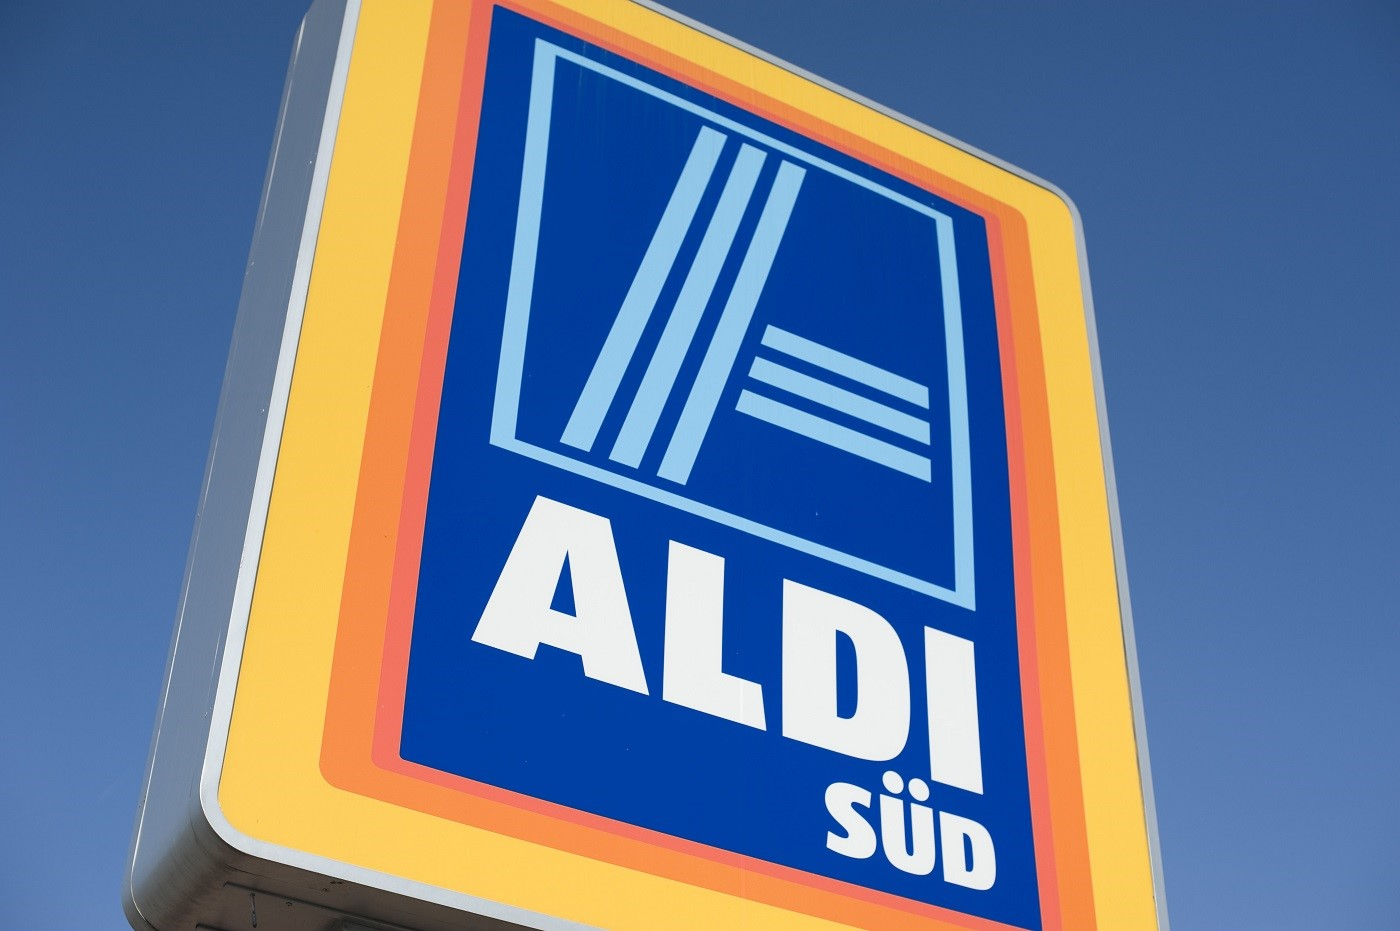 Aldi-Sued.De/Eiersuche